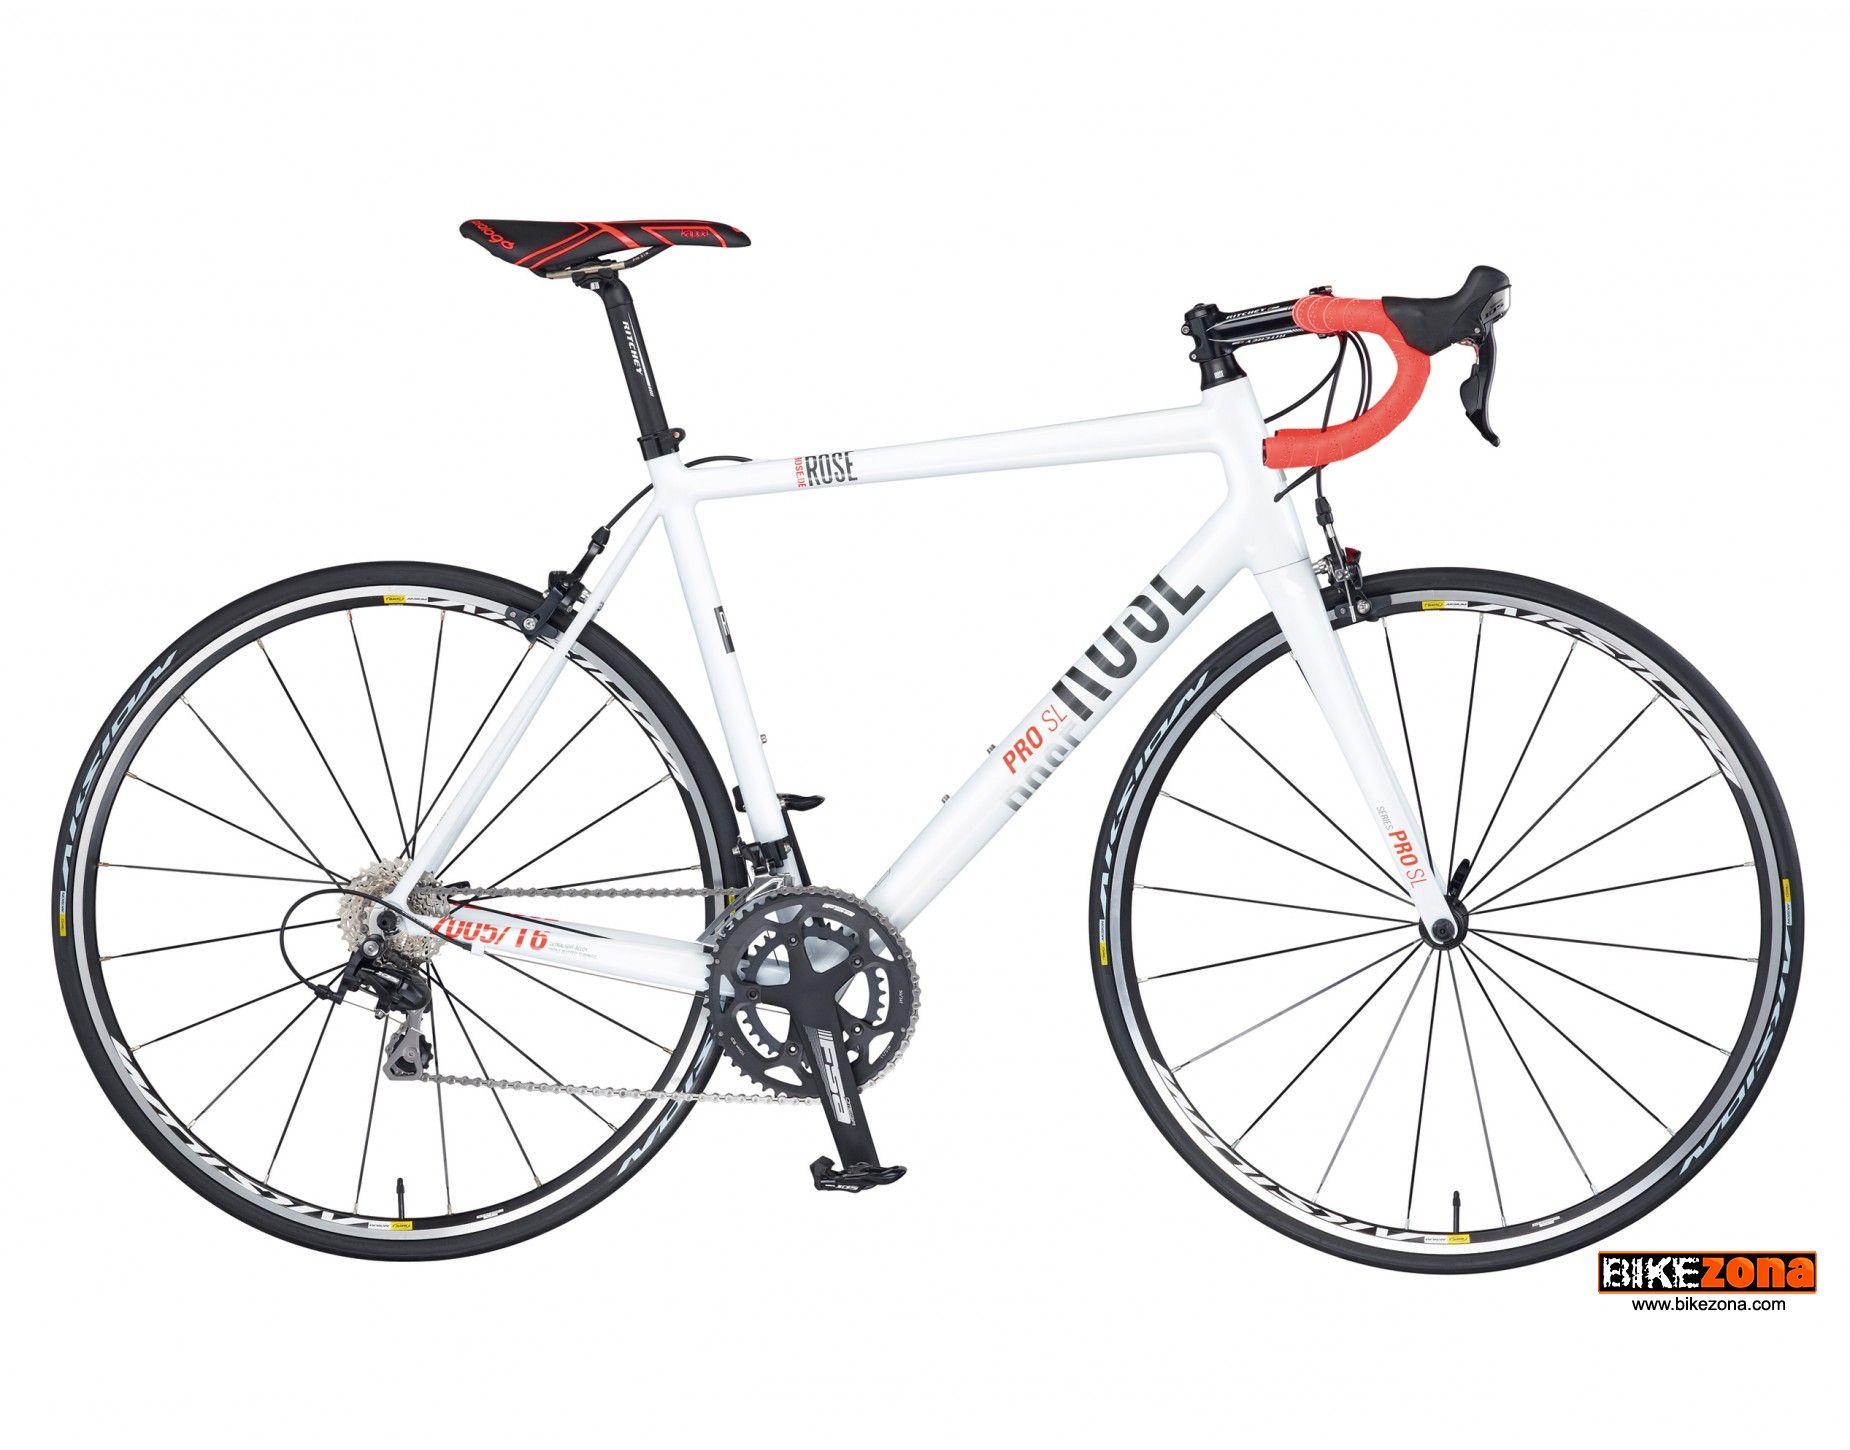 rose pro sl 2000 2014 bicicletas carretera catal go. Black Bedroom Furniture Sets. Home Design Ideas